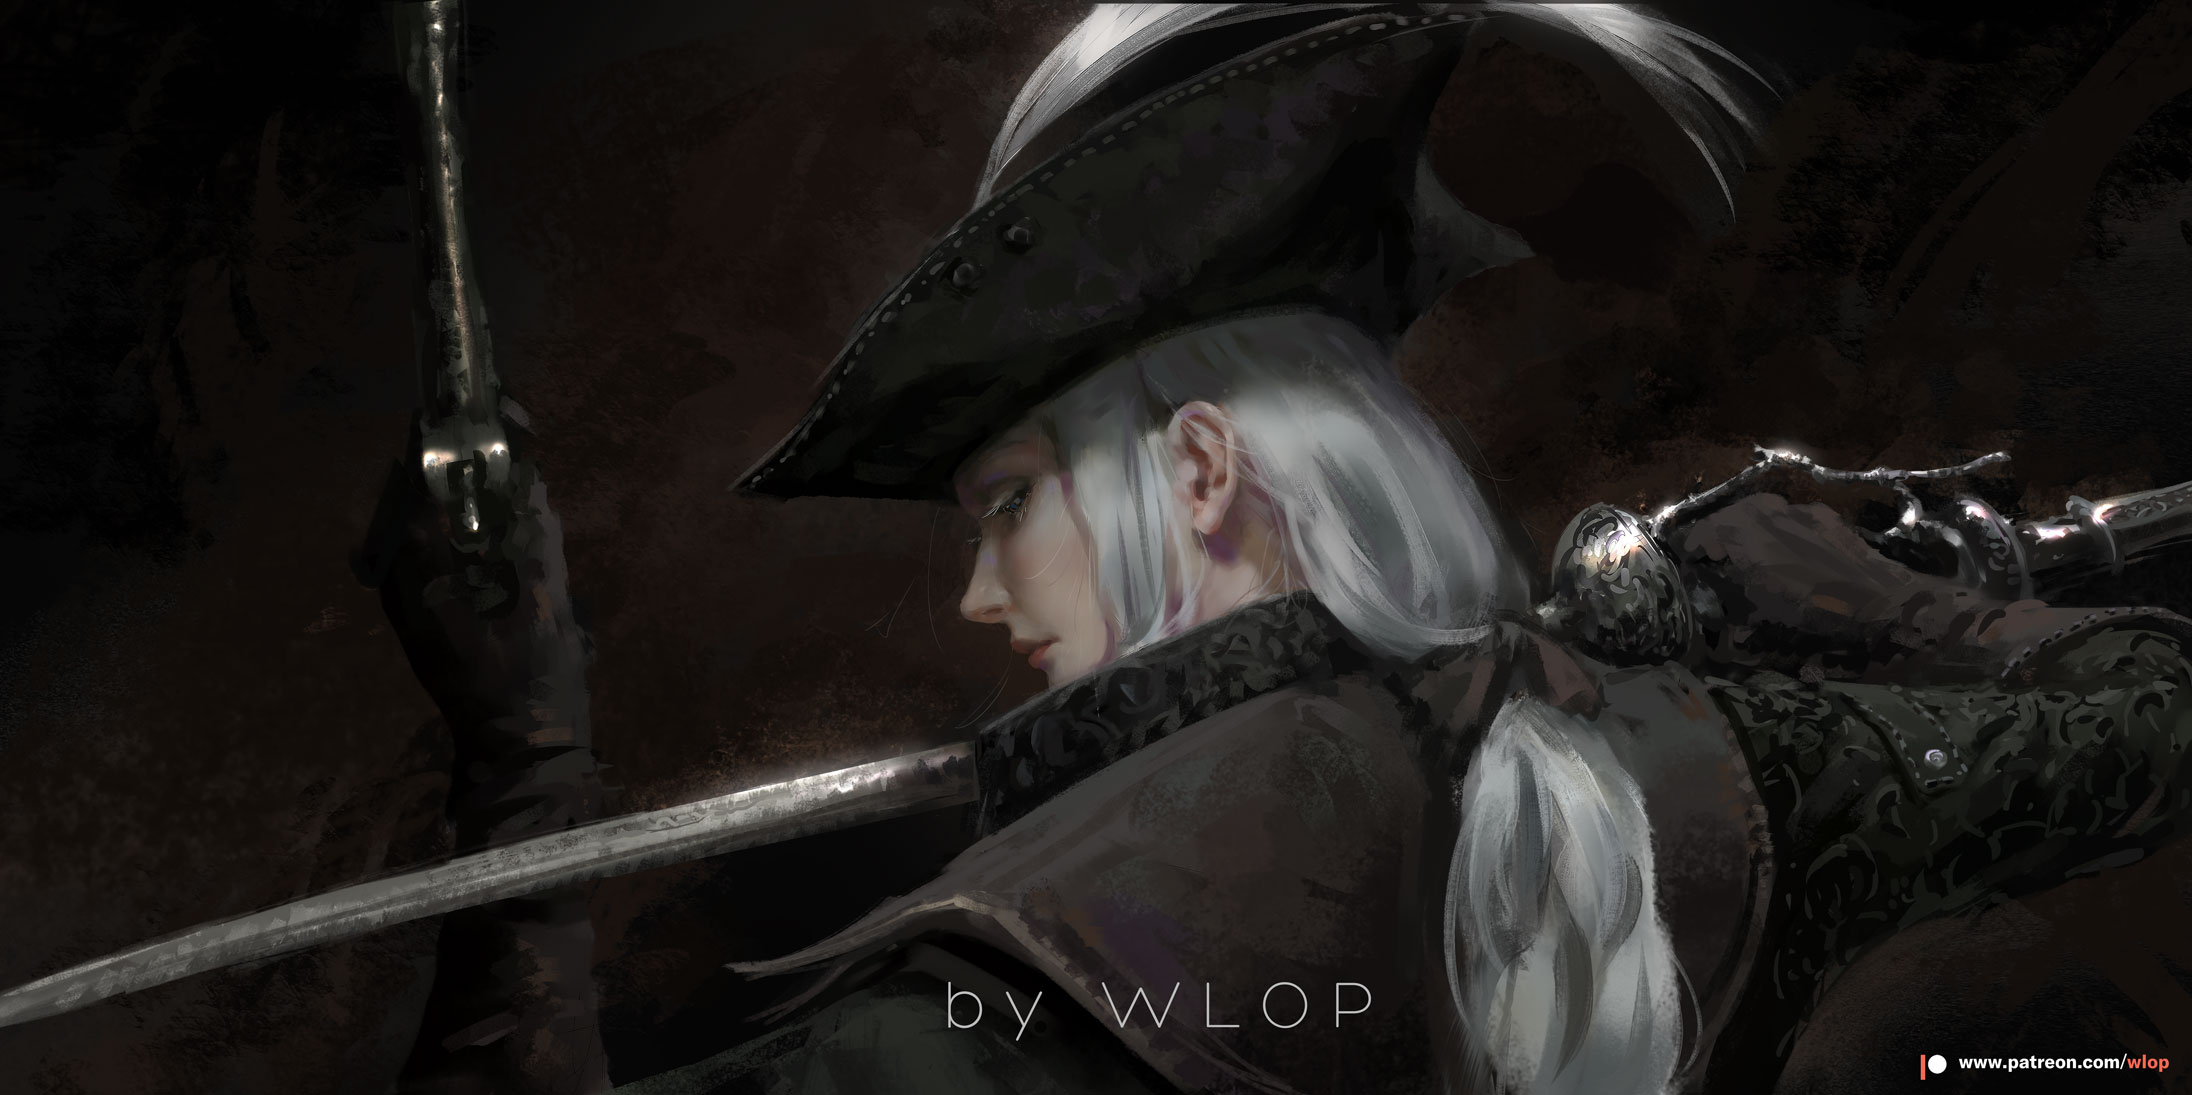 General 2192x1095 digital art women warrior weapon sword white hair hat fantasy girl WLOP Bloodborne Lady Maria